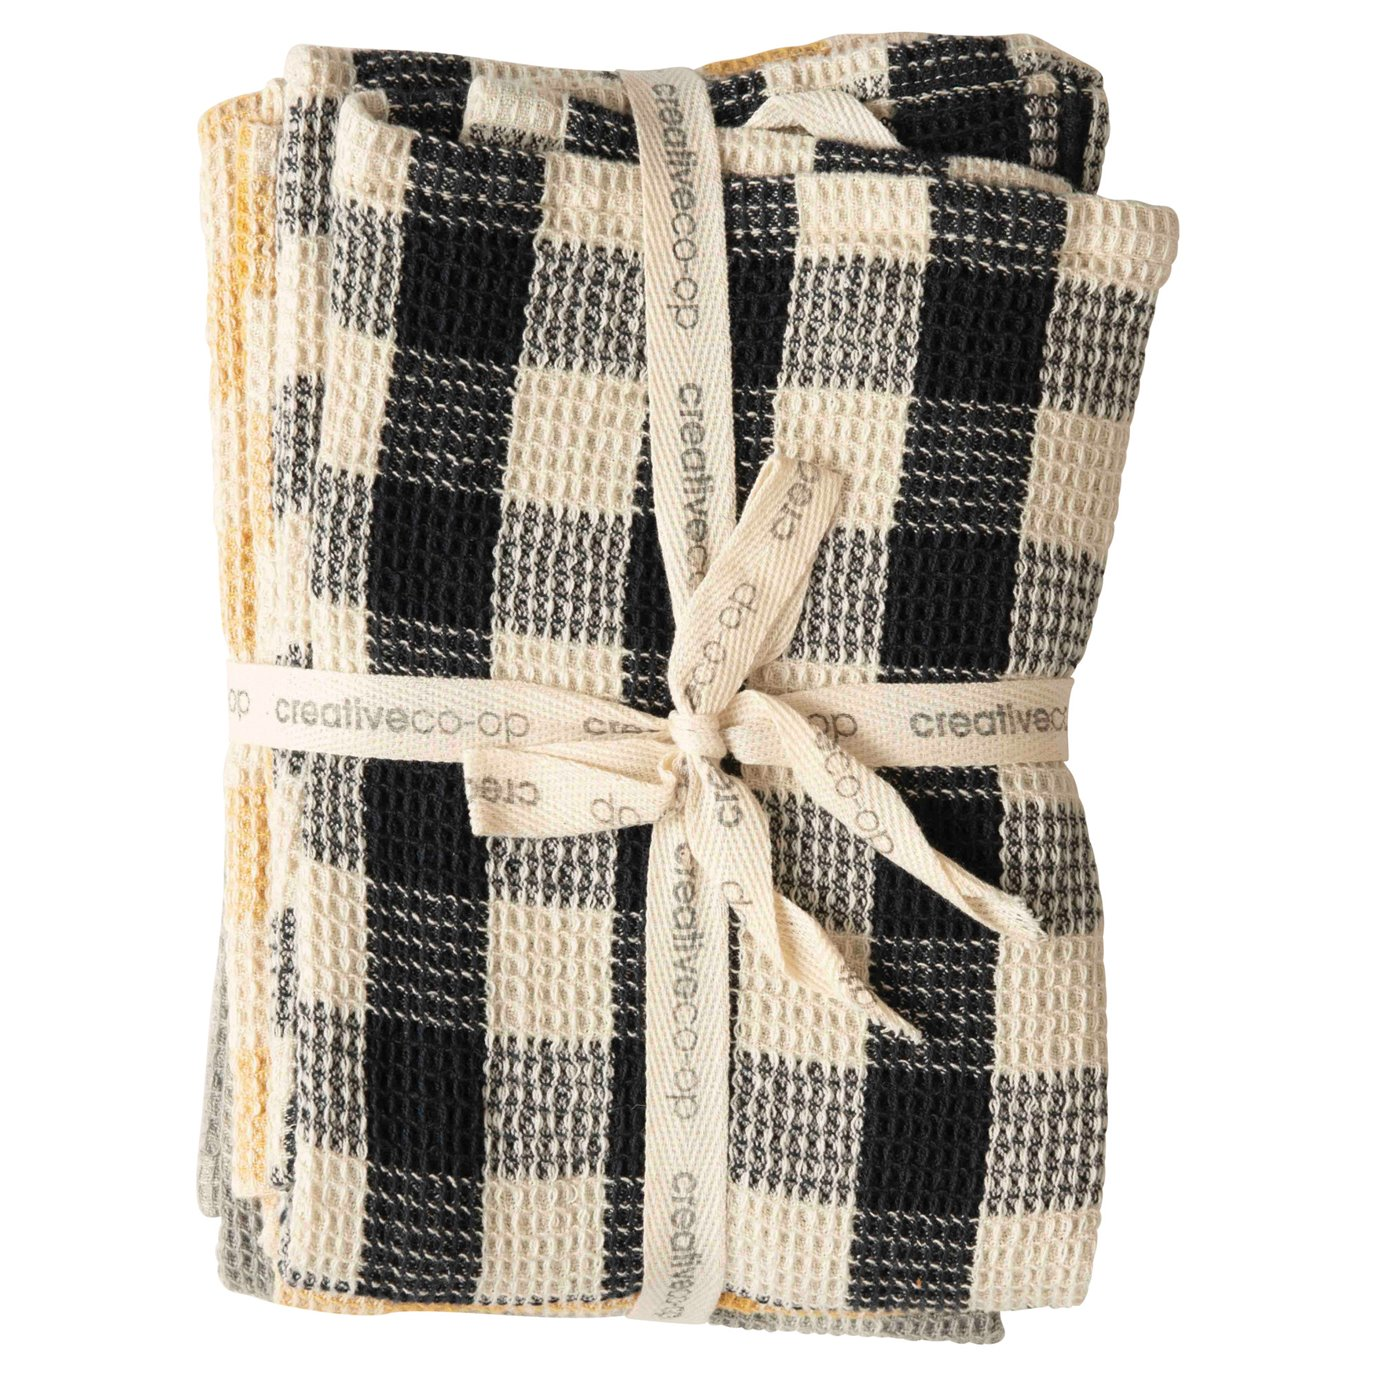 Gingham Cotton Waffle Weave Tea Towels (Set of 3 Colors)